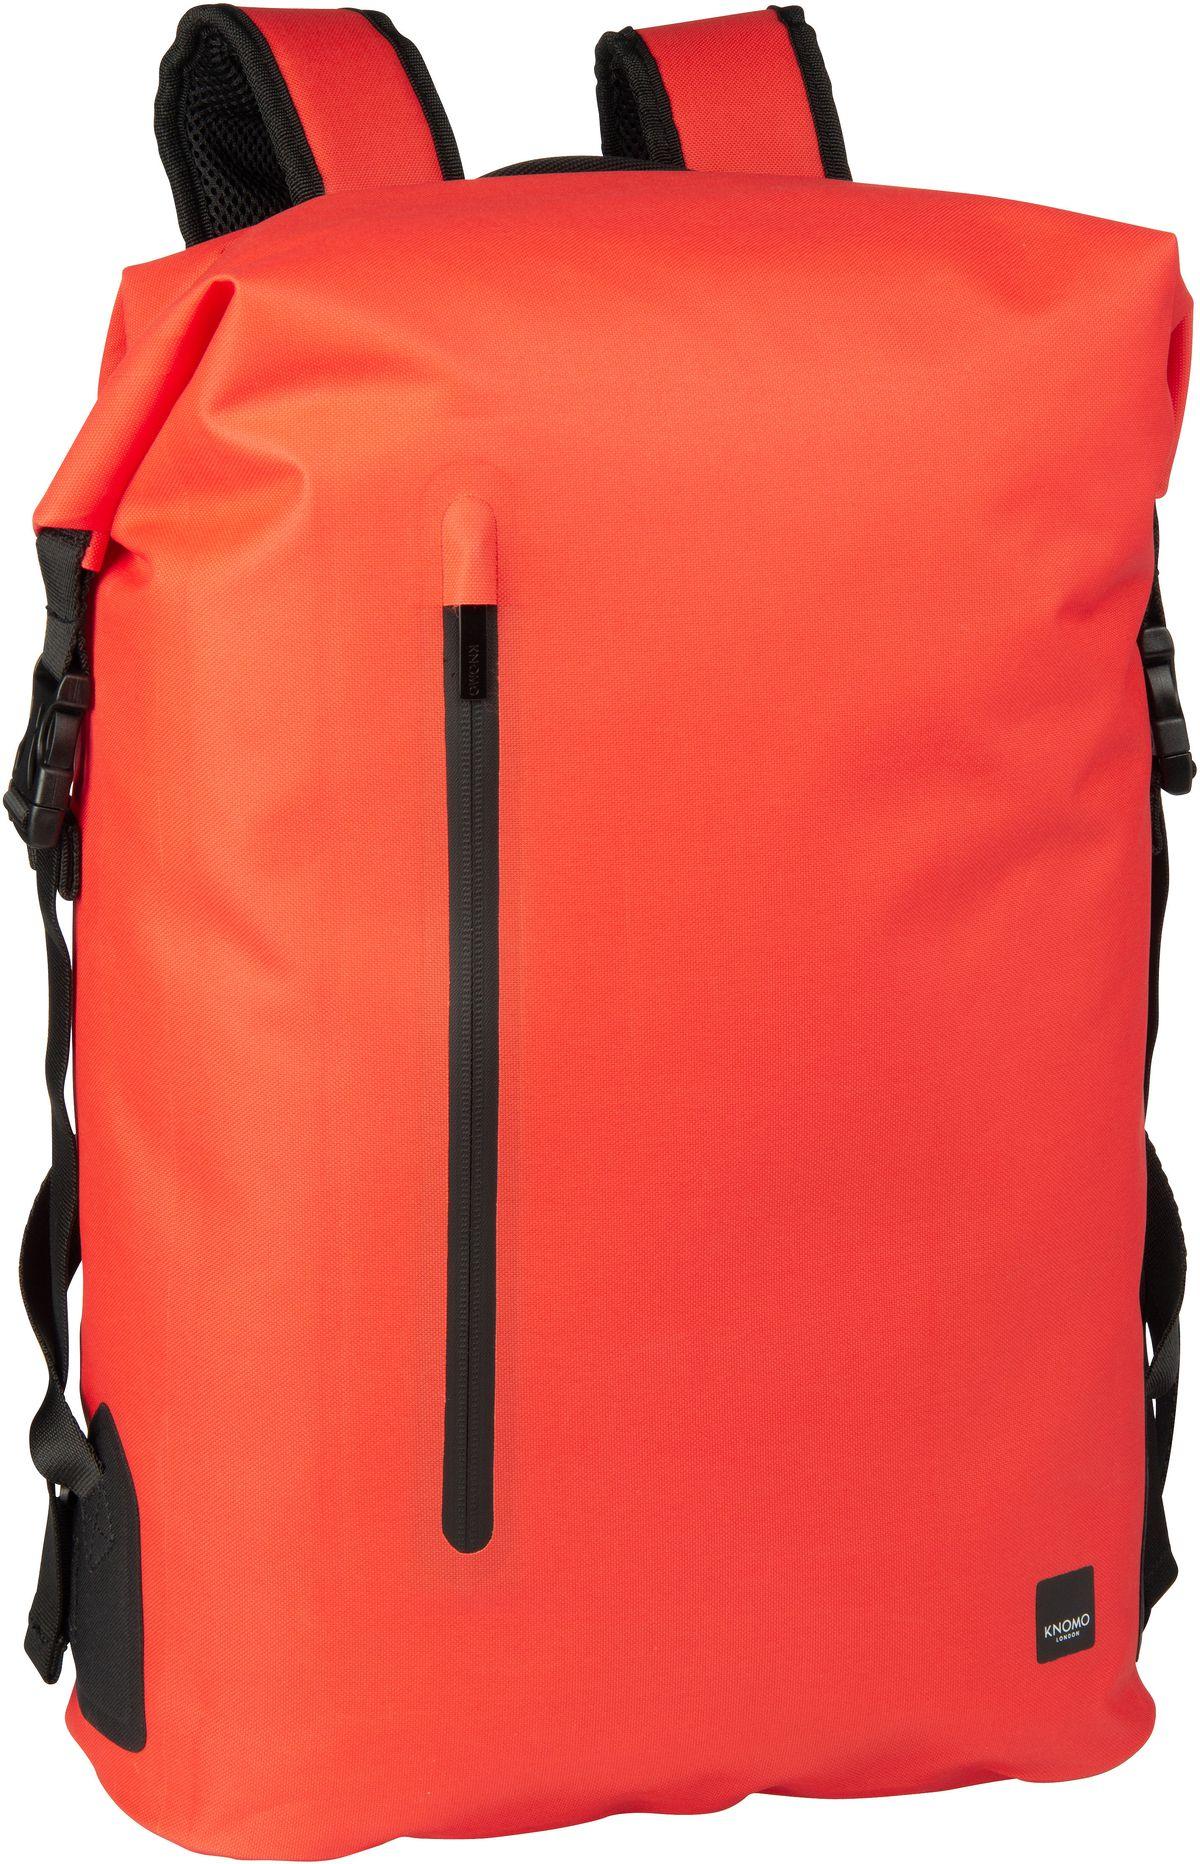 Rucksack / Daypack Thames Cromwell 15'' Flash Orange (27.5 Liter)